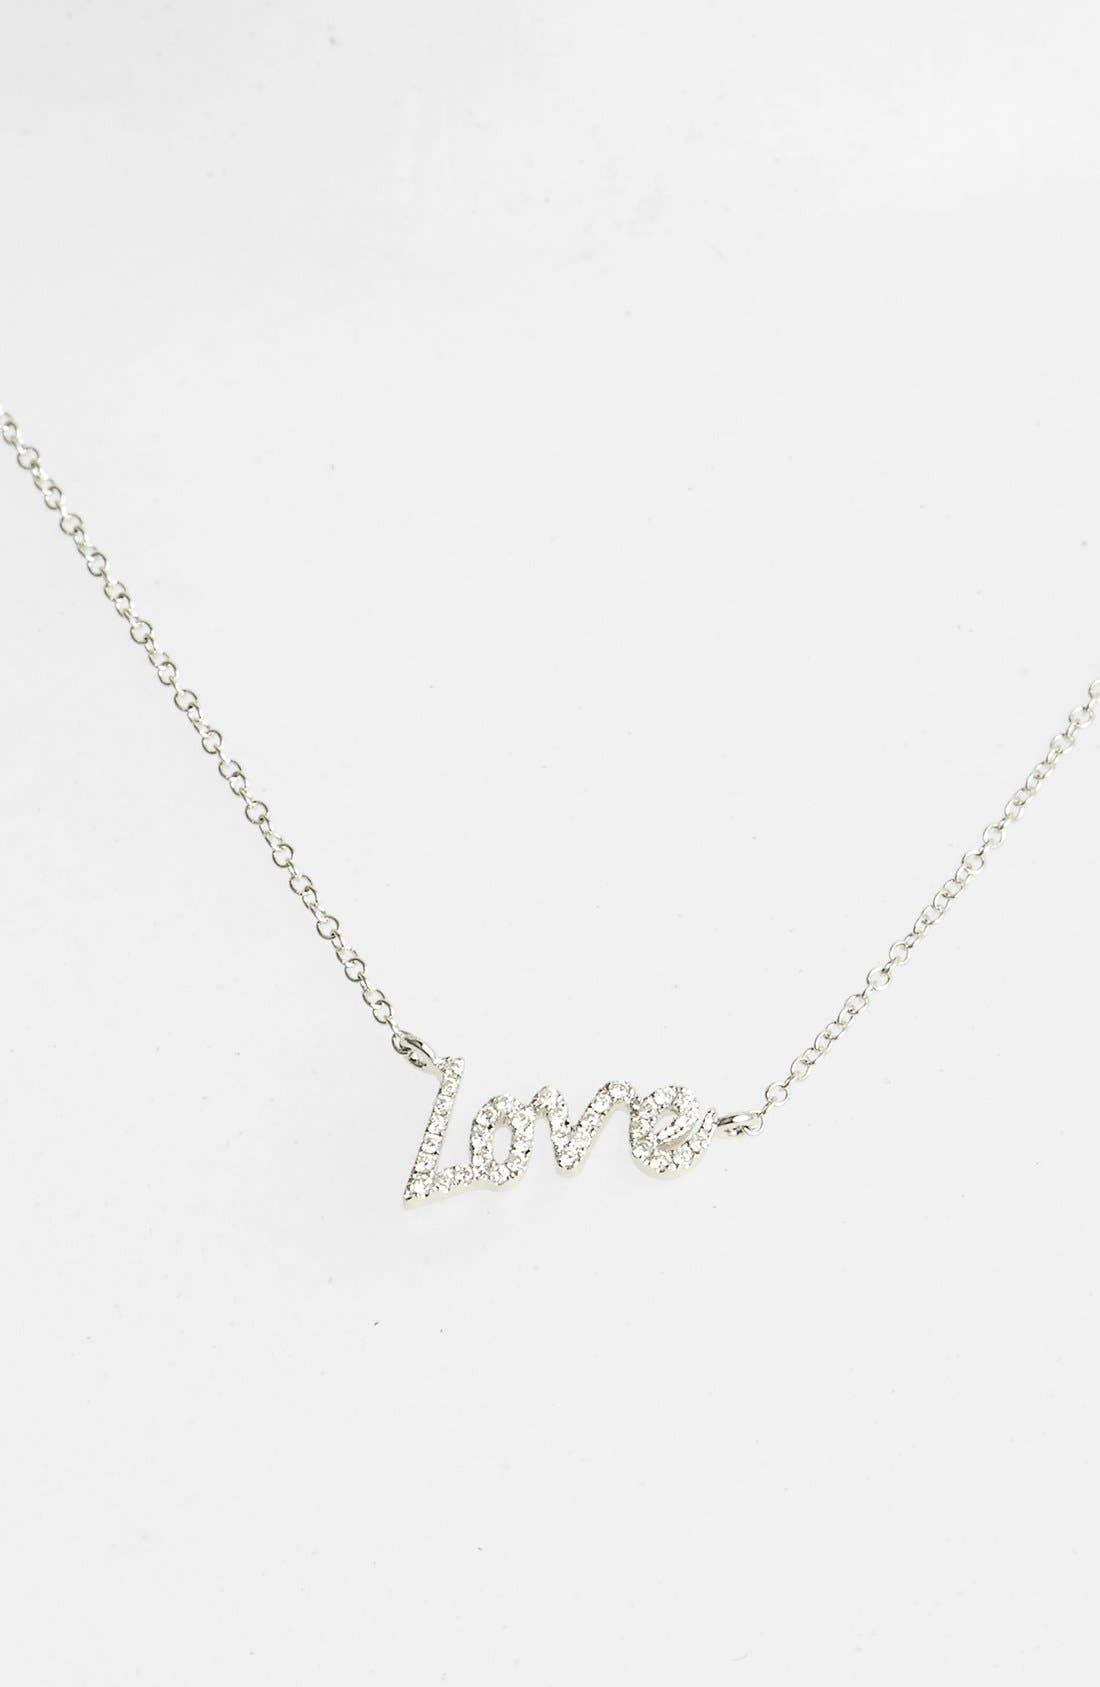 MeiraT Dazzling Diamond Love Pendant Necklace,                             Main thumbnail 1, color,                             WHITE GOLD